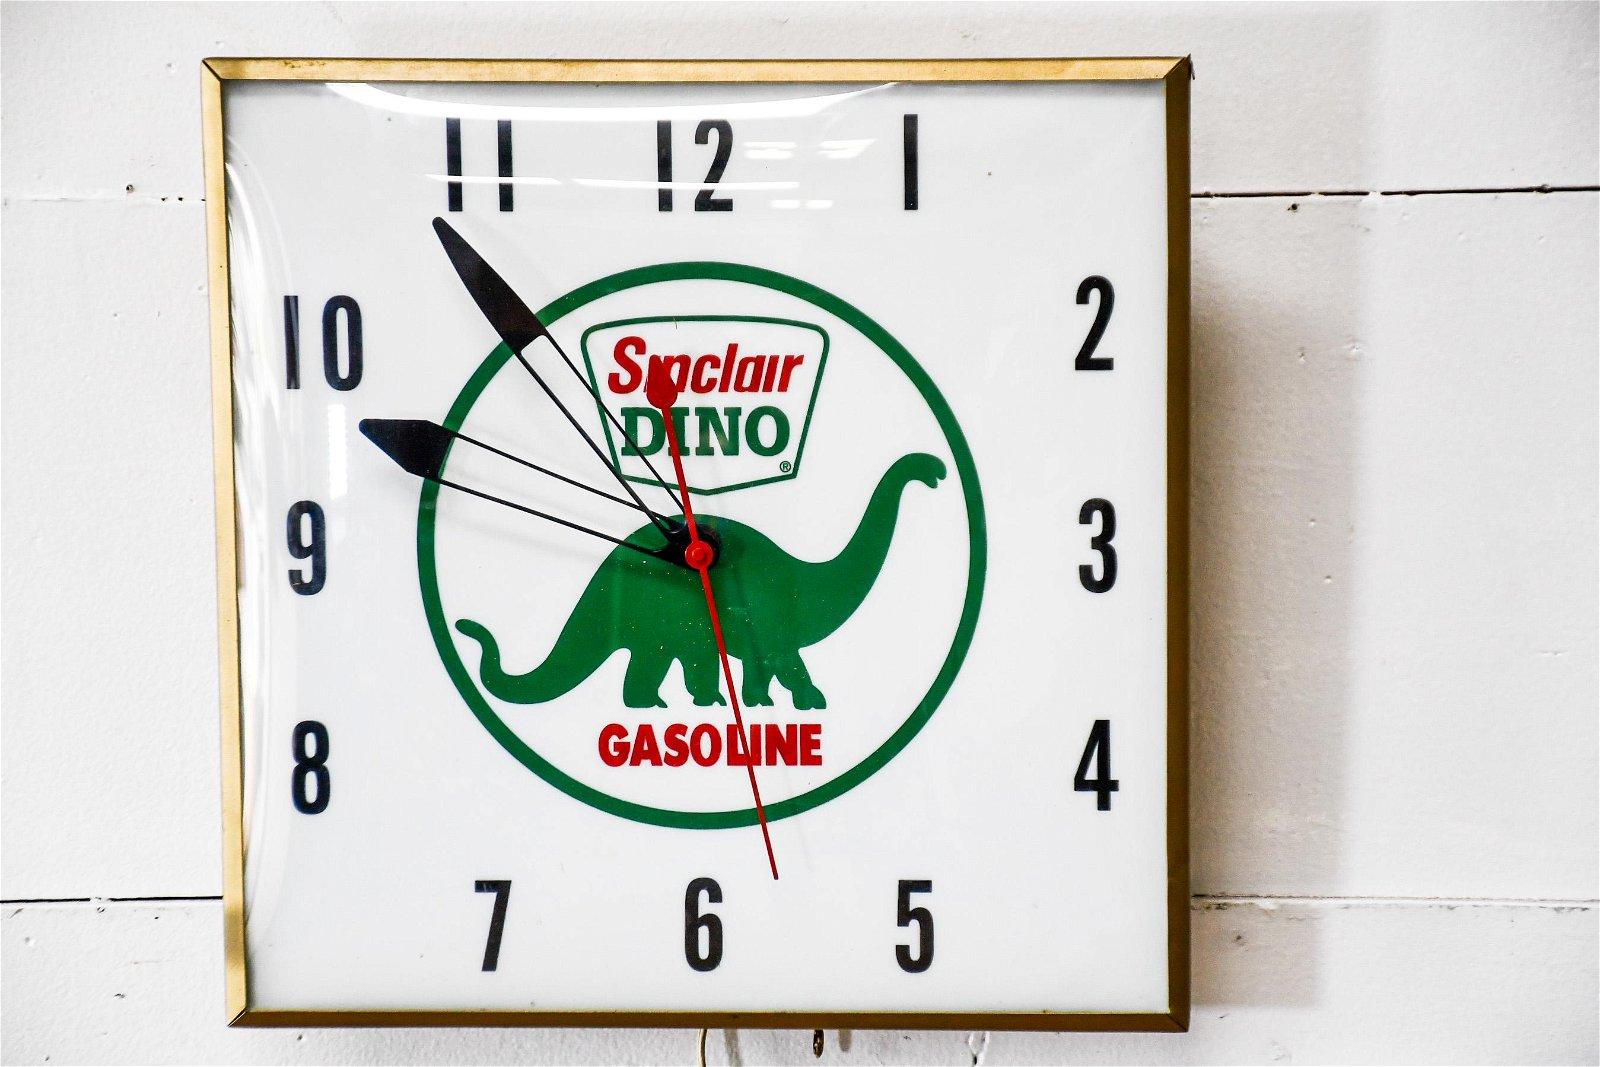 Sinclair Dino Gasoline Advertising Clock - works 15